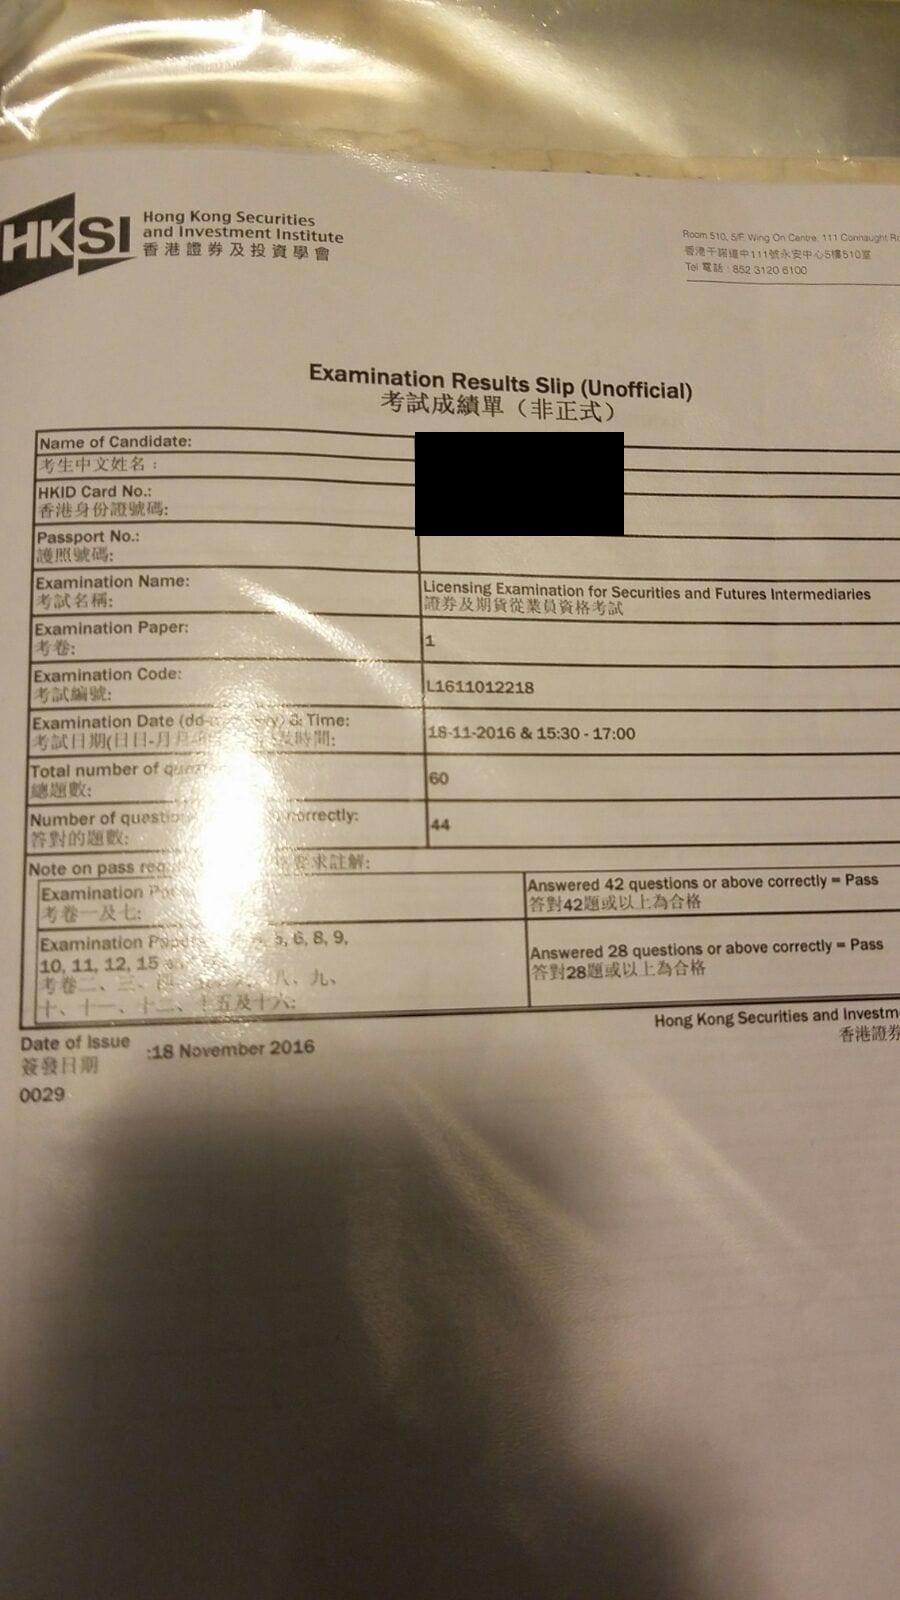 LKF 18/11/2016 LE Paper 1 證券期貨從業員資格考試卷一 Pass